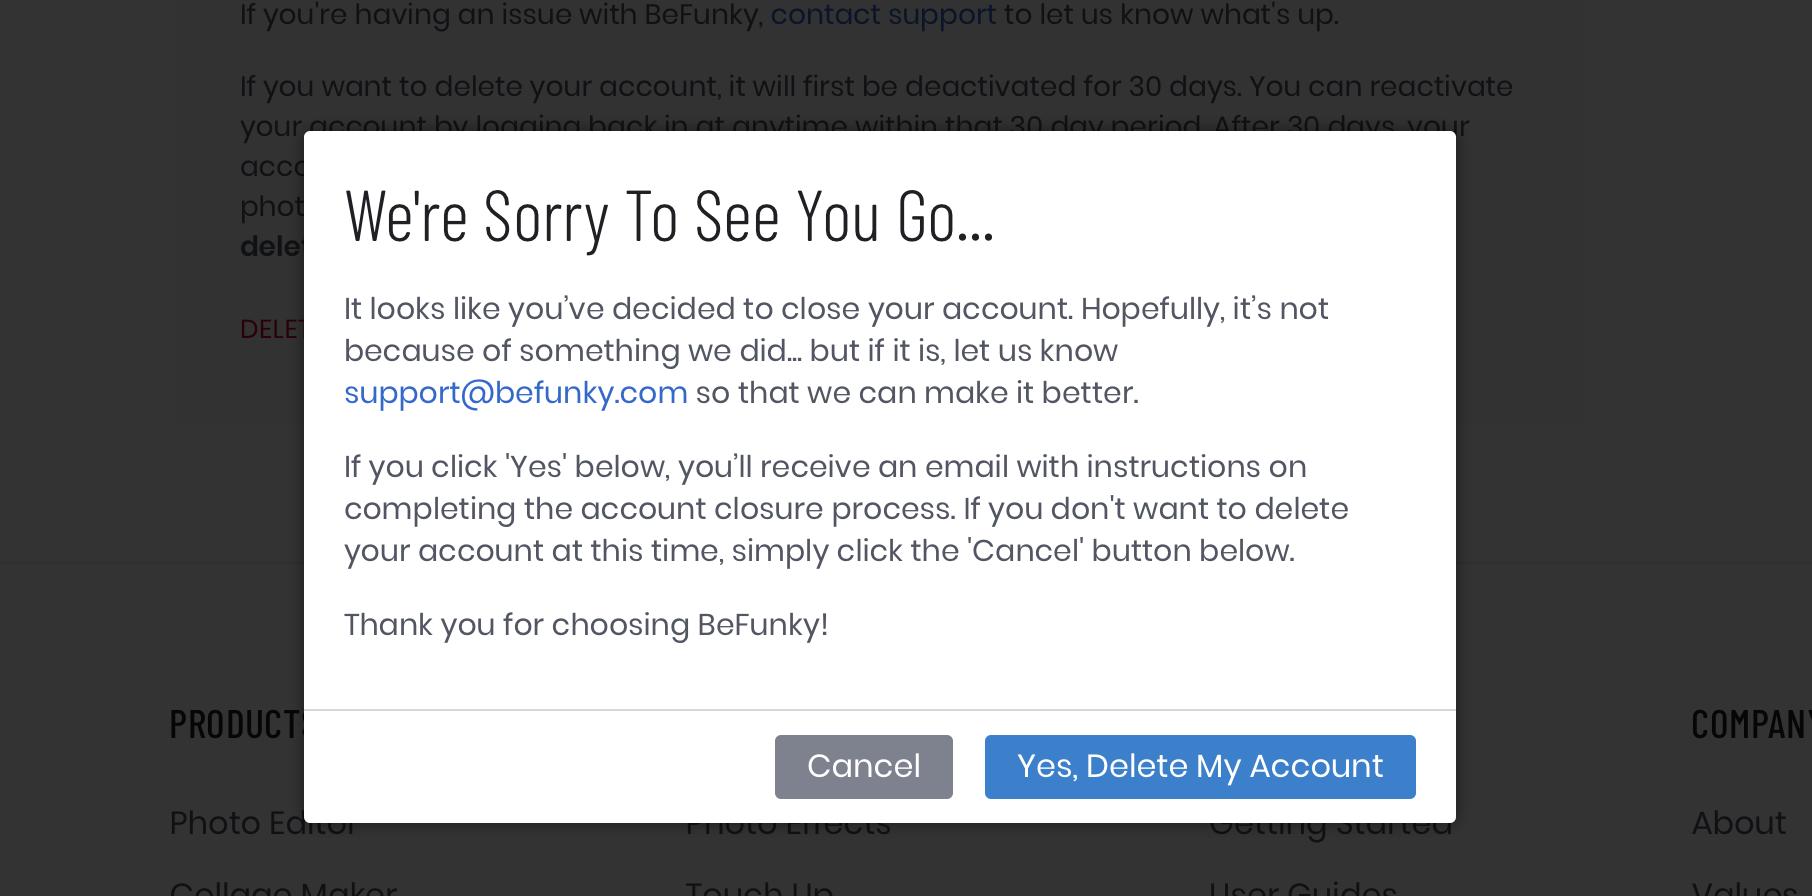 How Do I Close My Account? – BeFunky Help Center